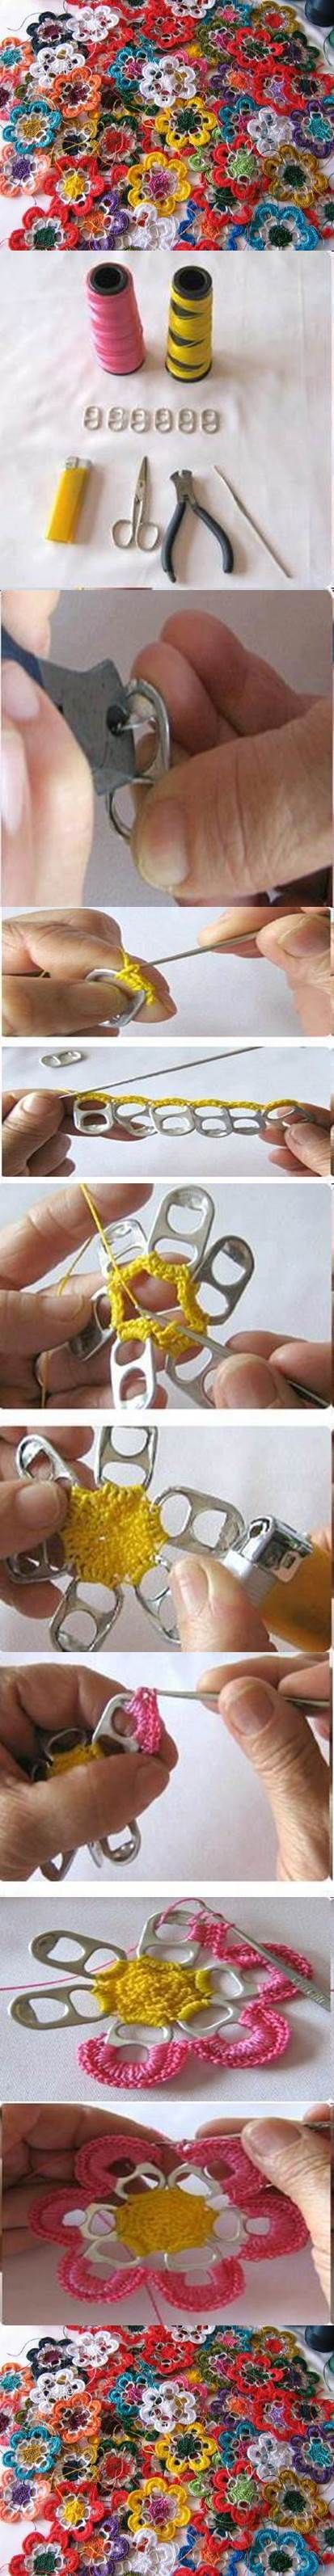 DIY Pull Tabs Crochet Flowers #crochet #pattern #flowers #pull_tab